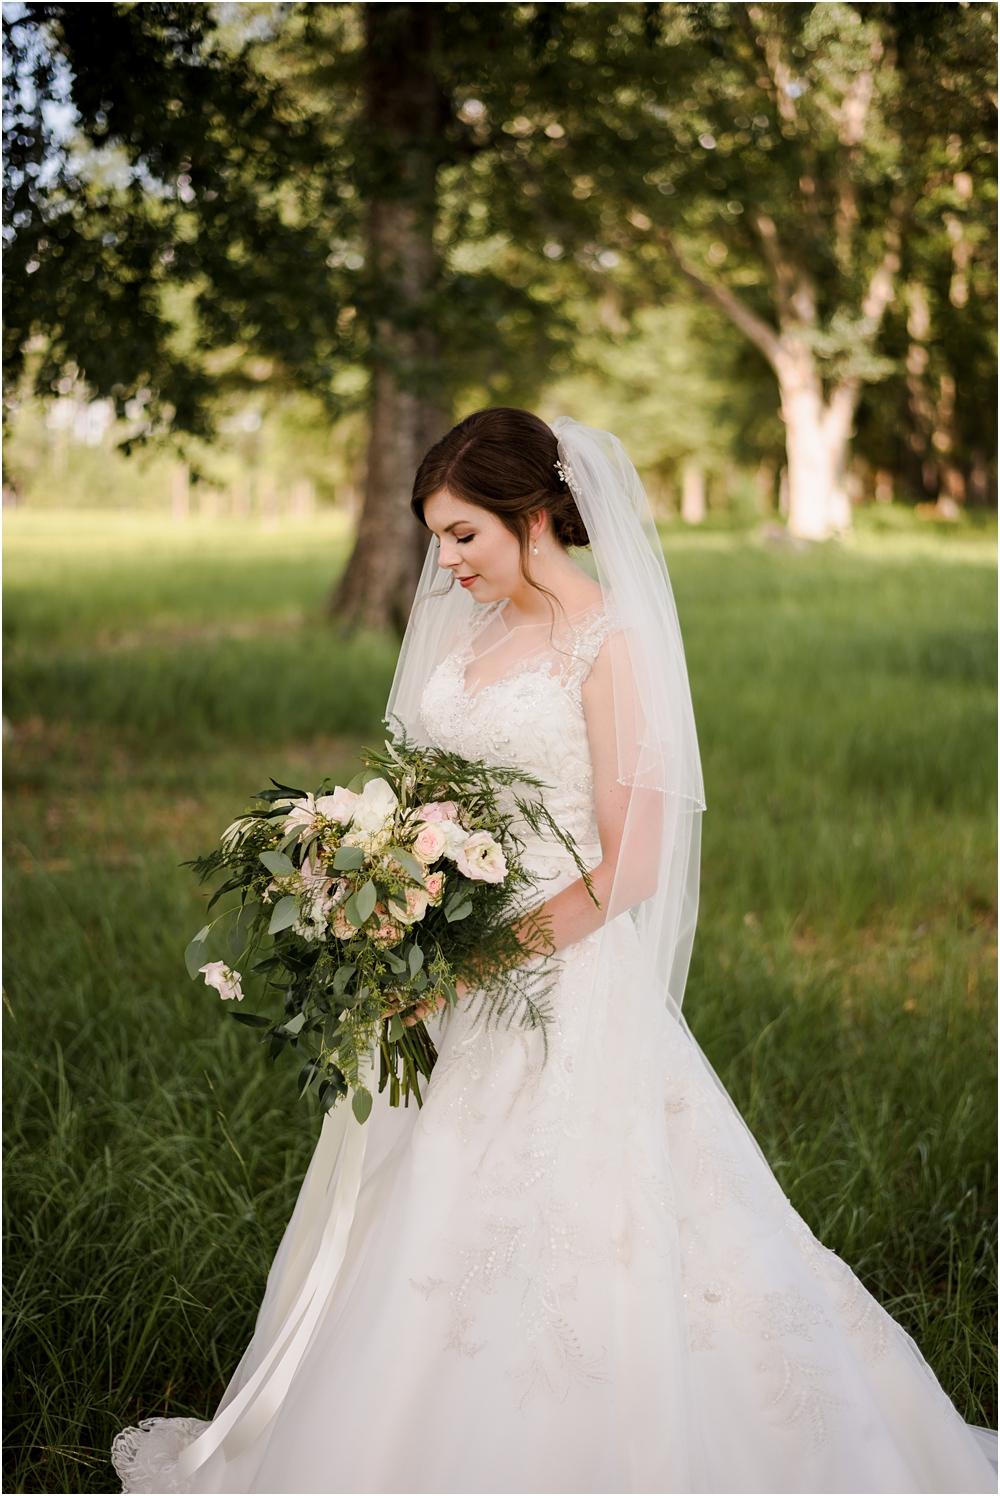 marianna-florida-wedding-photographer-kiersten-grant-34.jpg